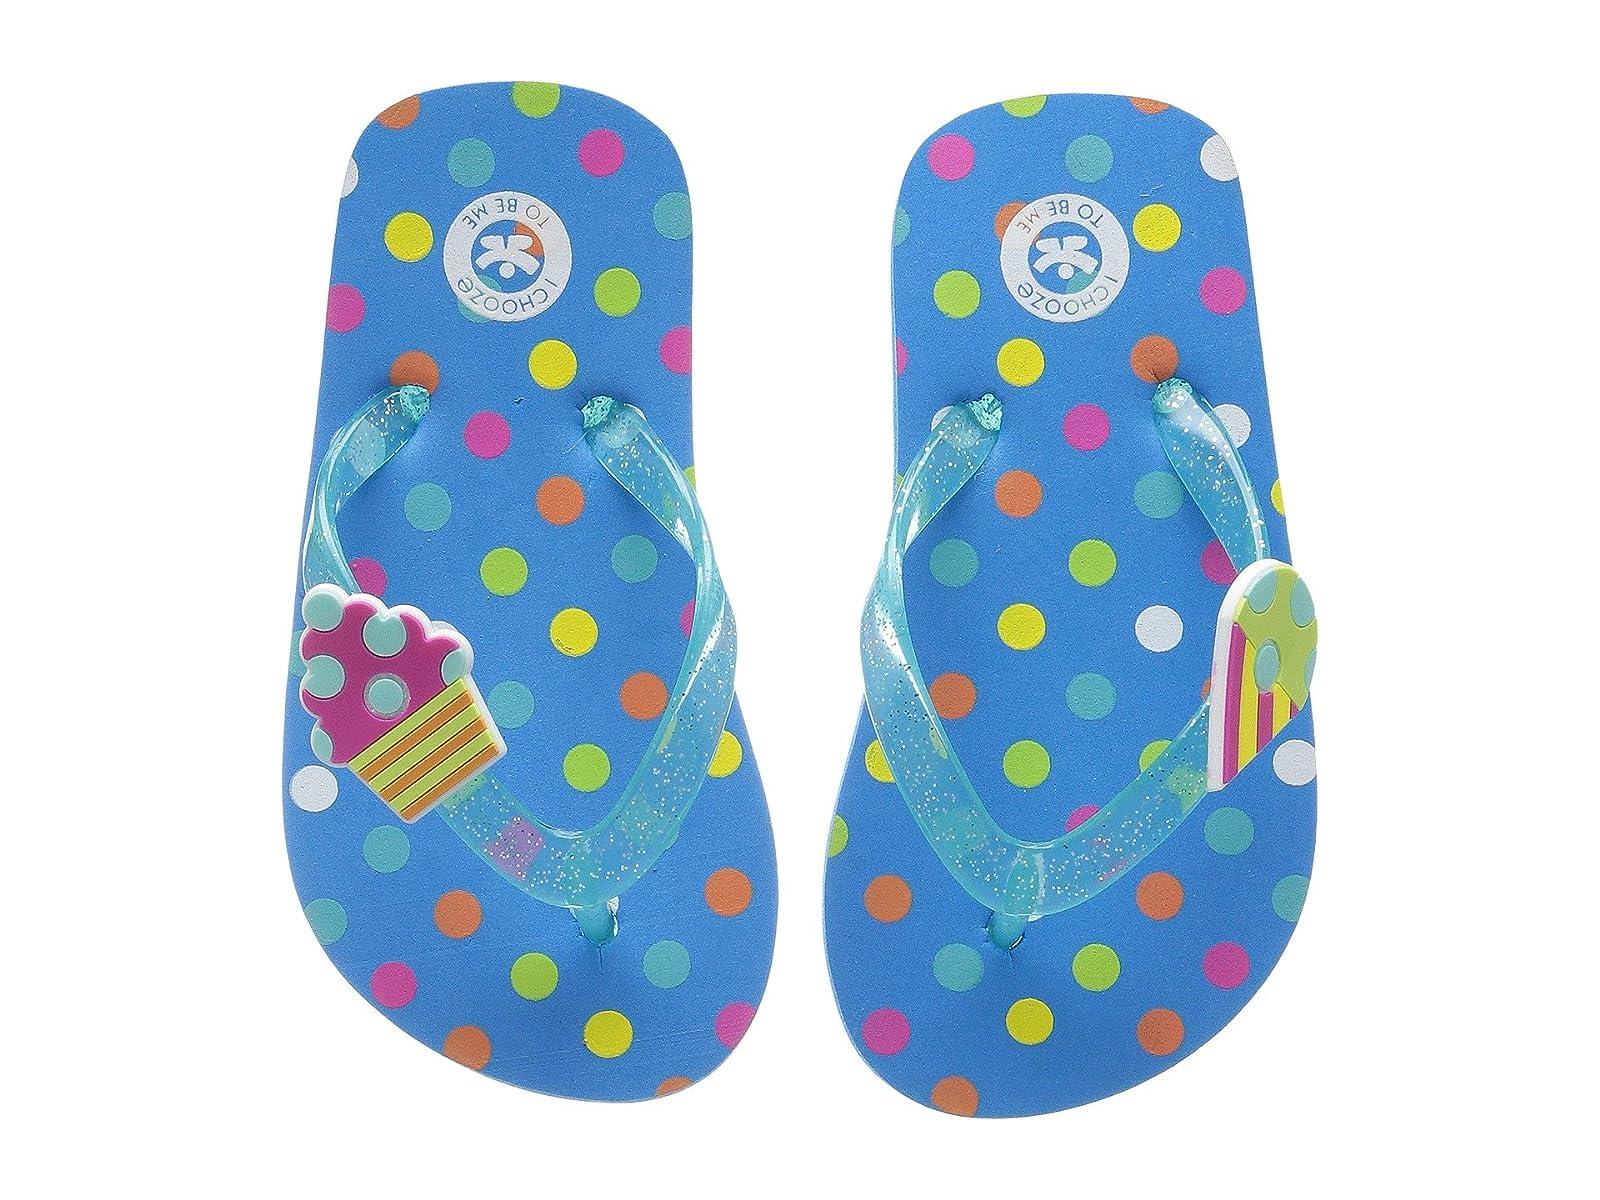 CHOOZE Flip (Toddler/Little Kid/Big Kid)Comfortable and distinctive shoes